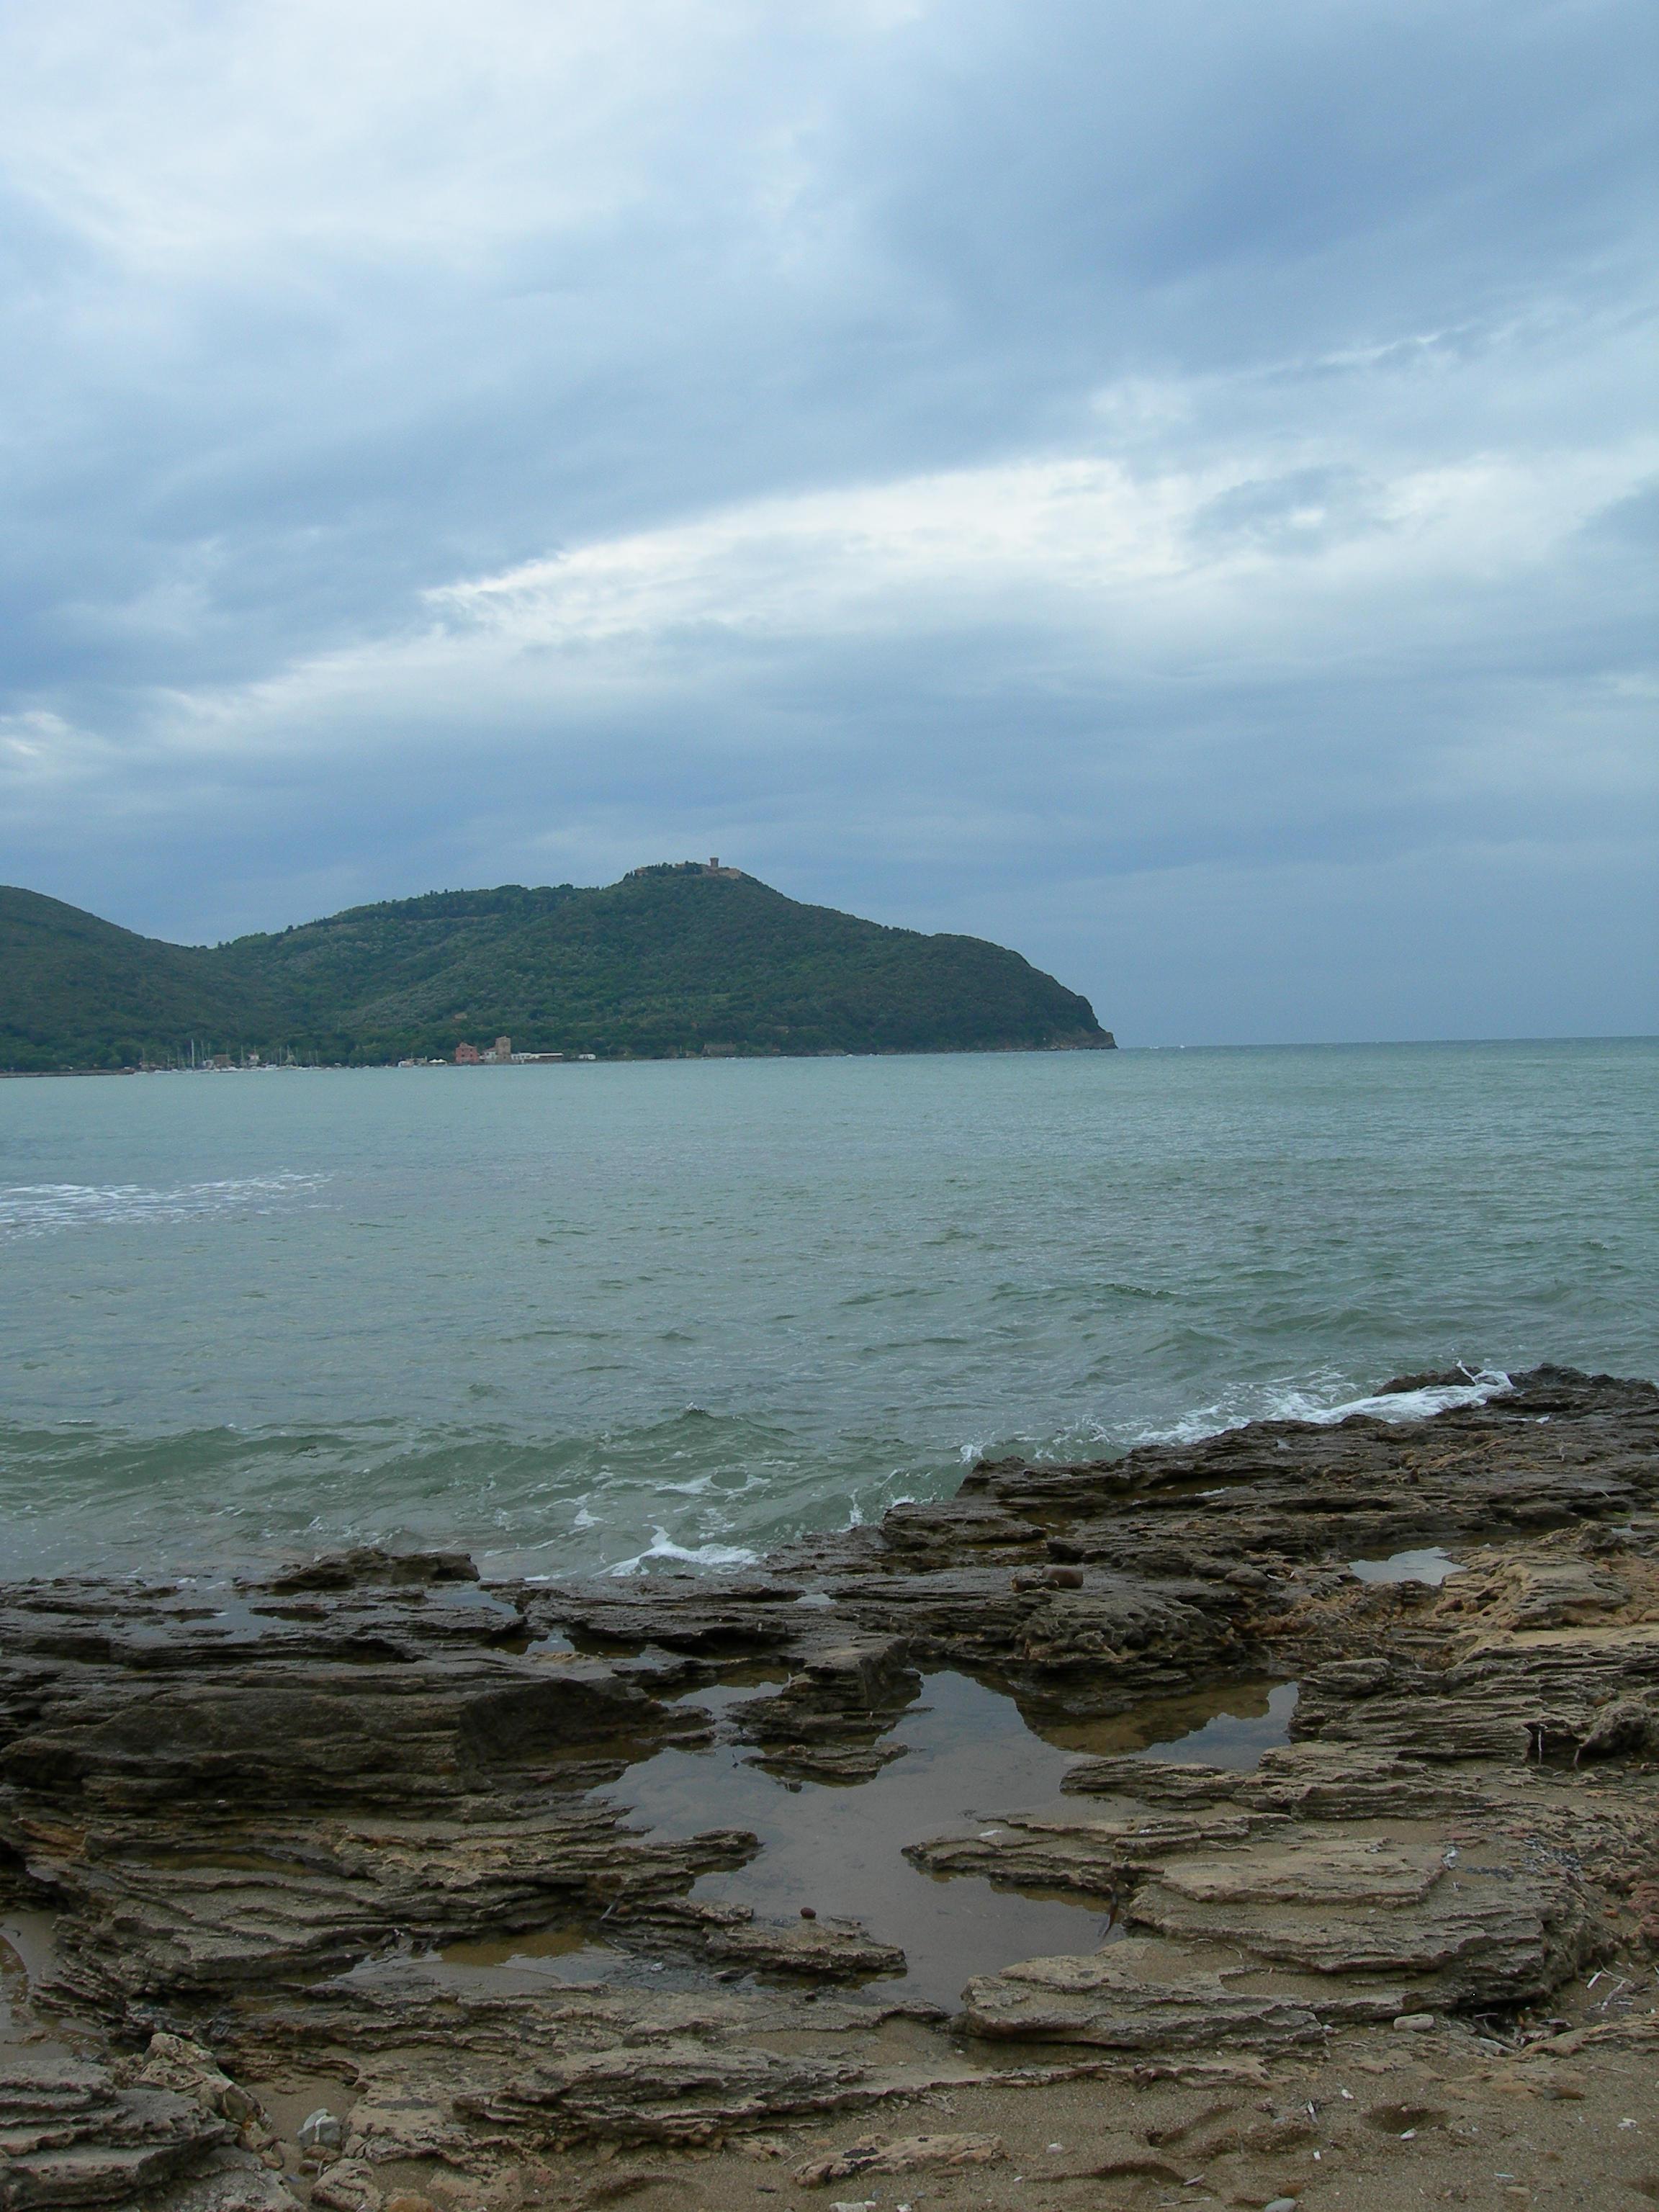 Golfo di Baratti by kuschelirmel-stock